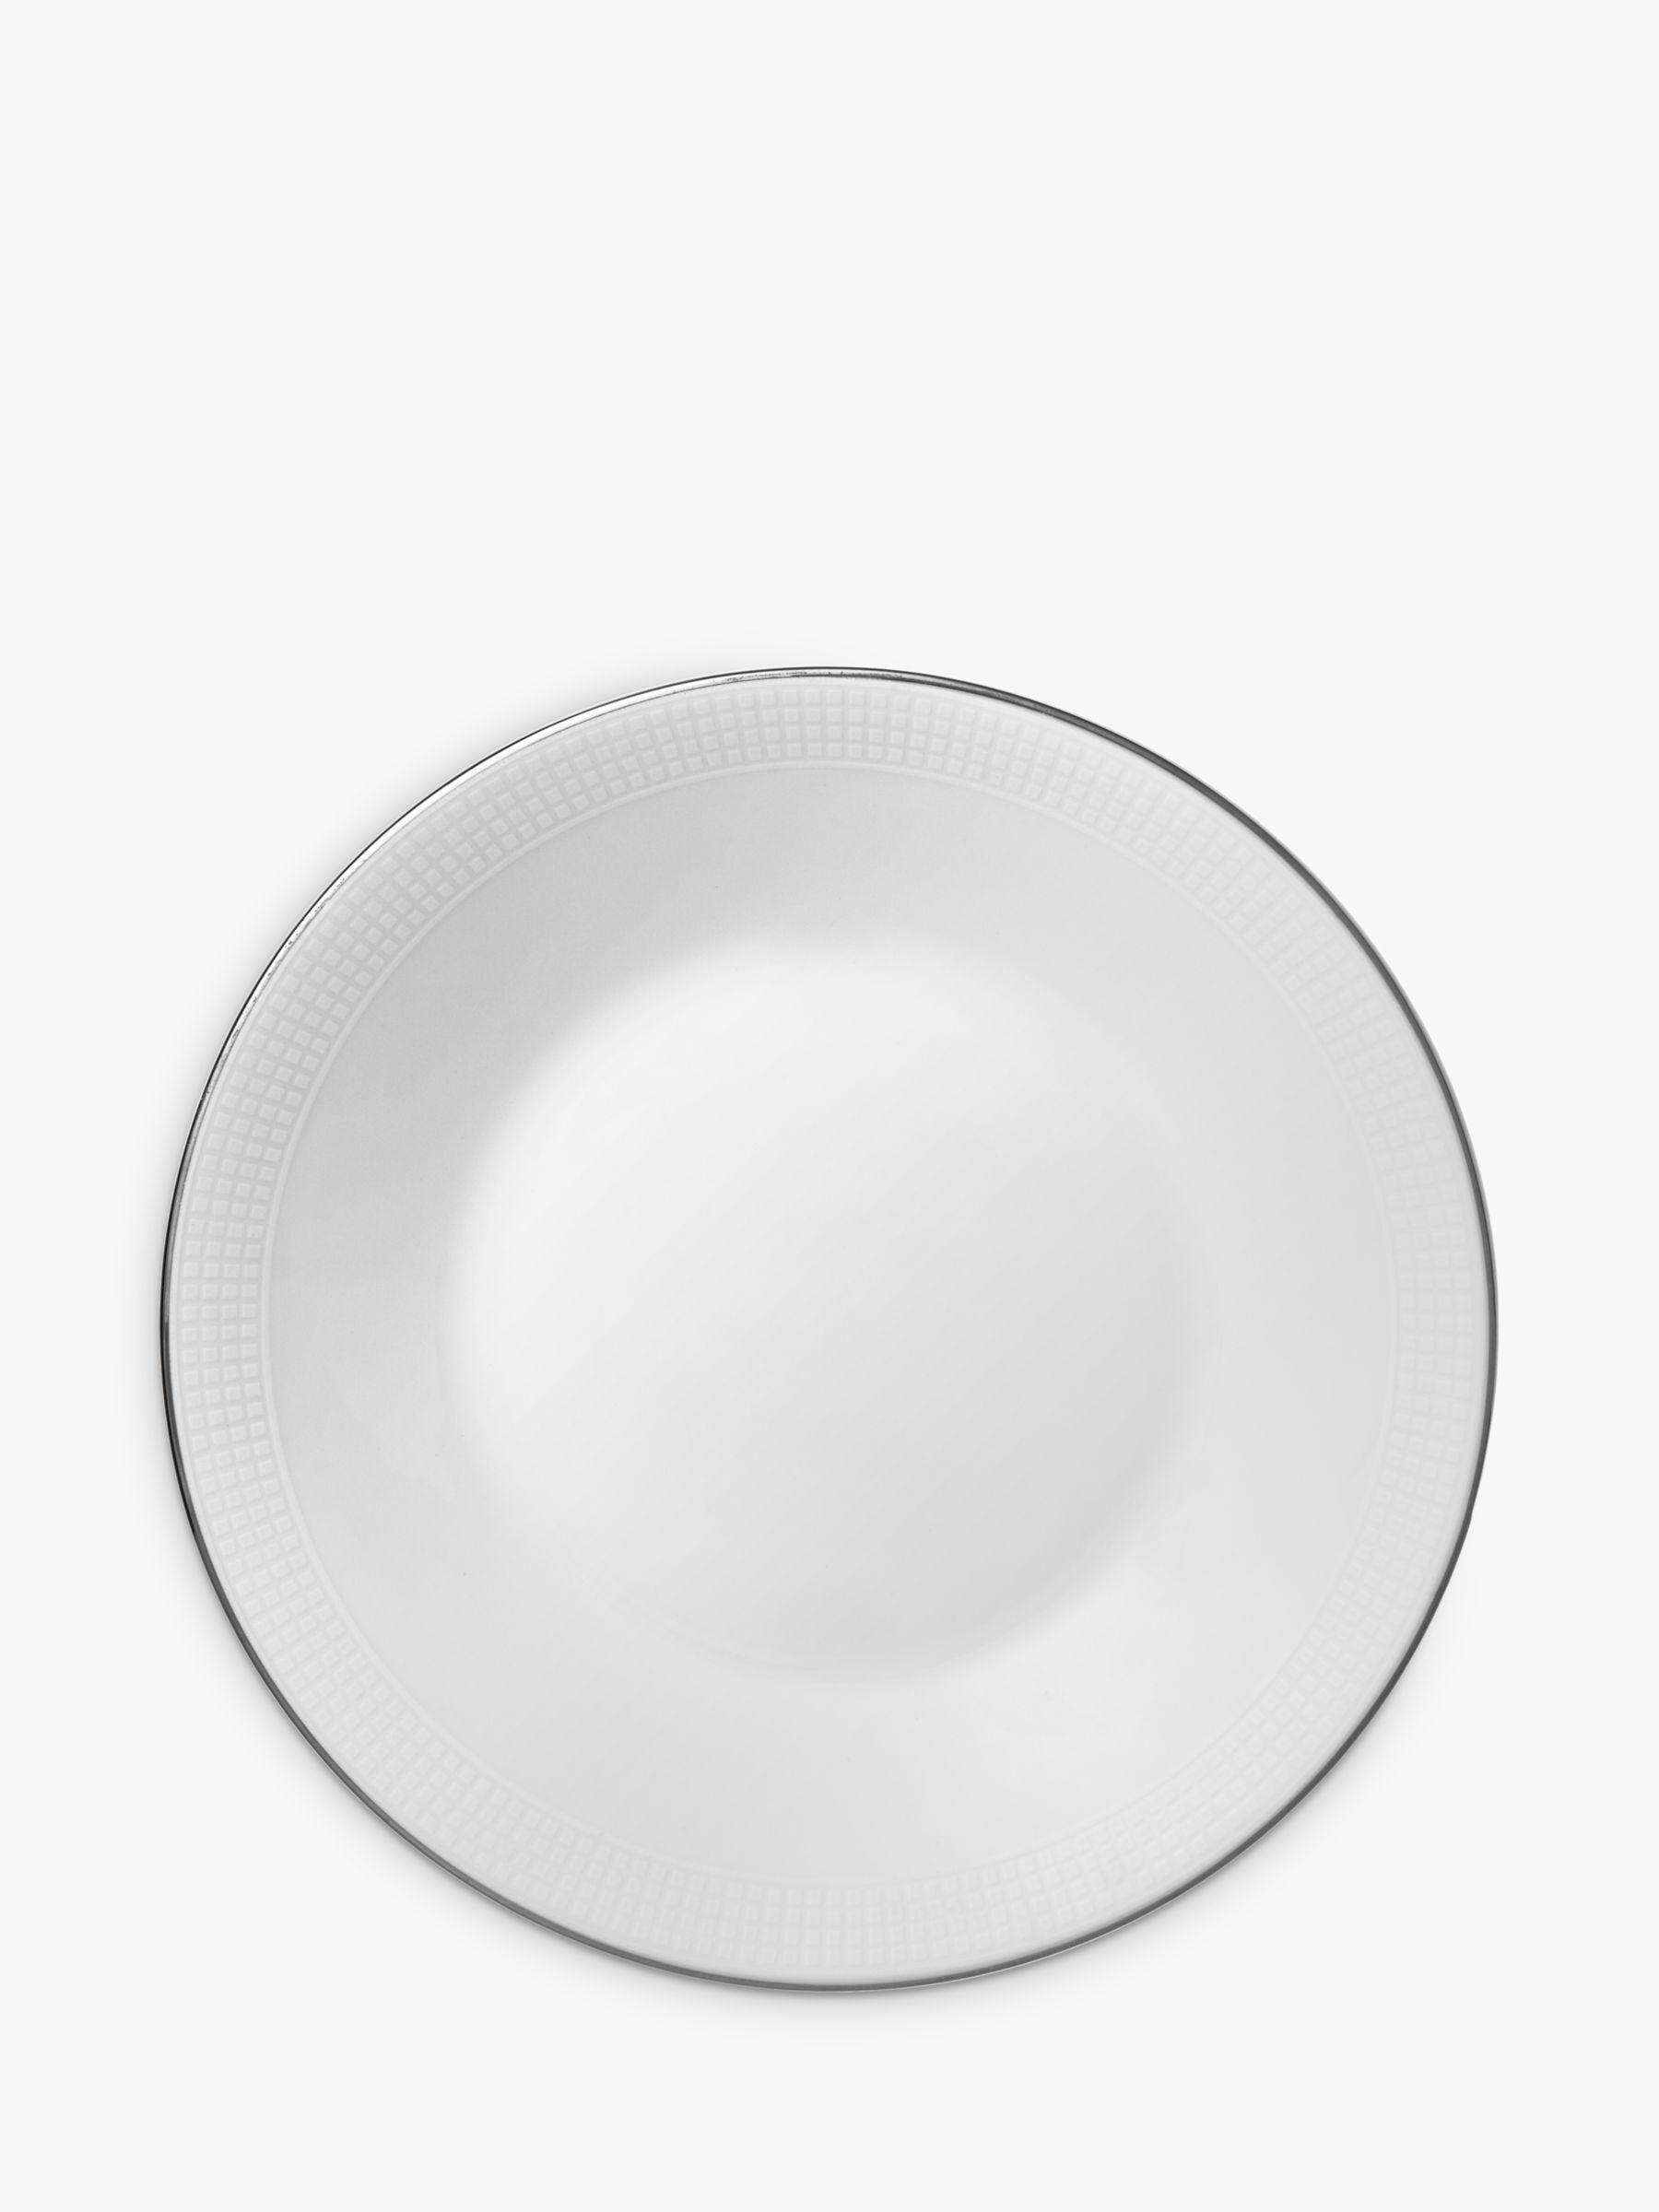 Vera Wang for Wedgwood Vera Wang for Wedgwood Blanc sur Blanc Tea Saucer, Dia.10.5cm, White